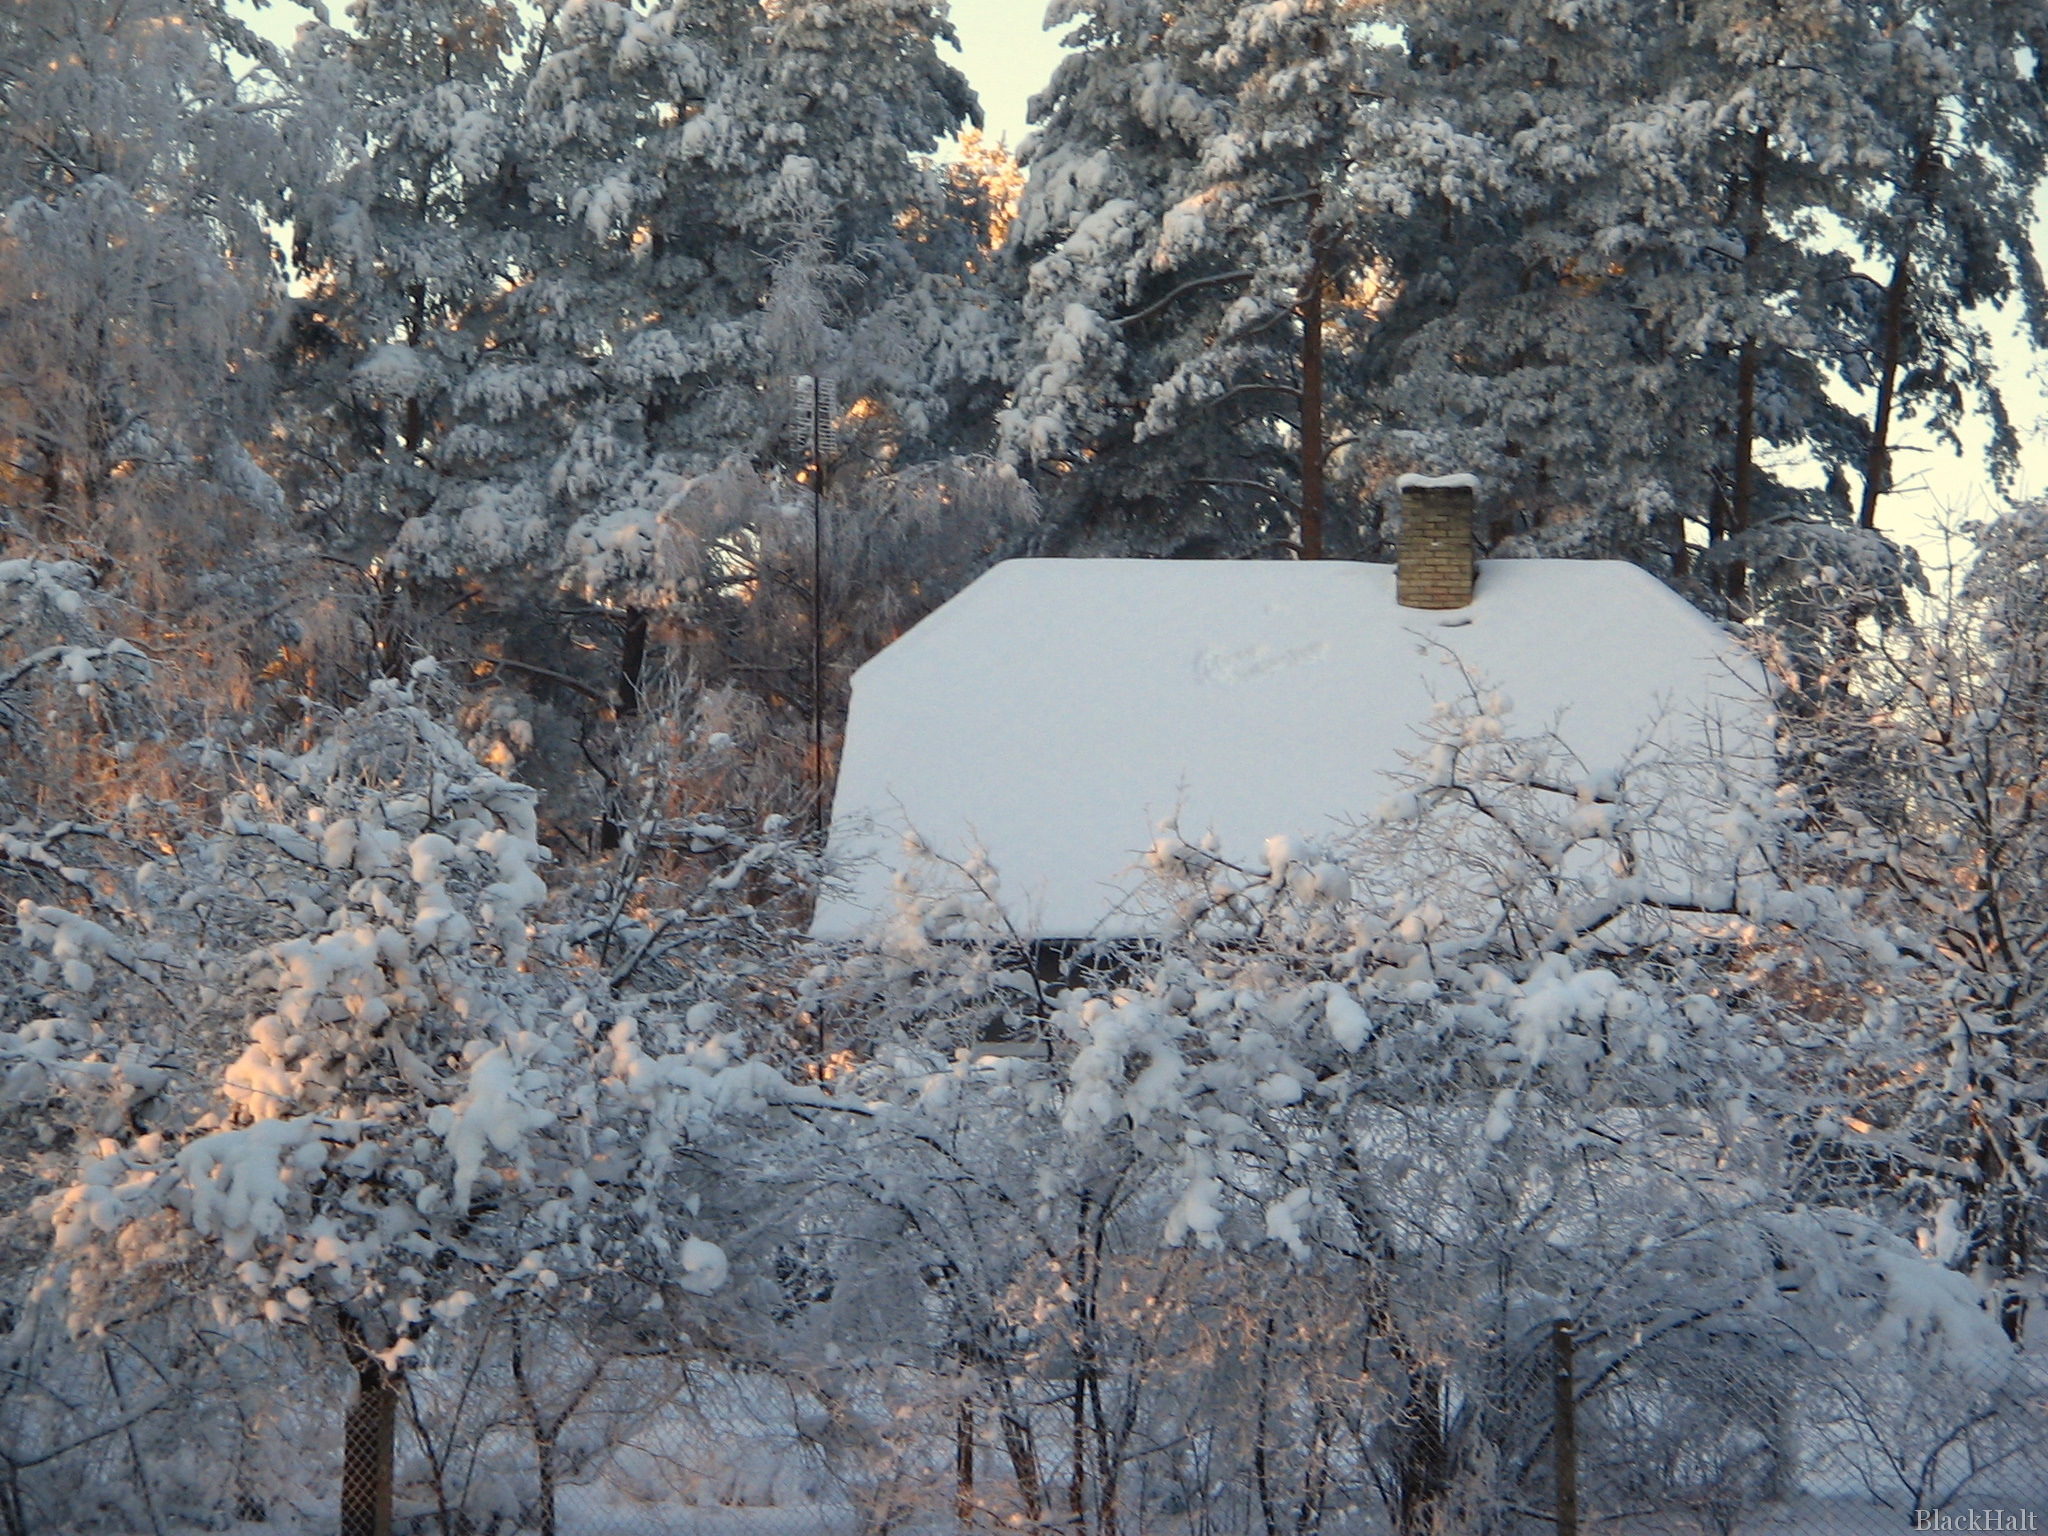 Sniegs, māja